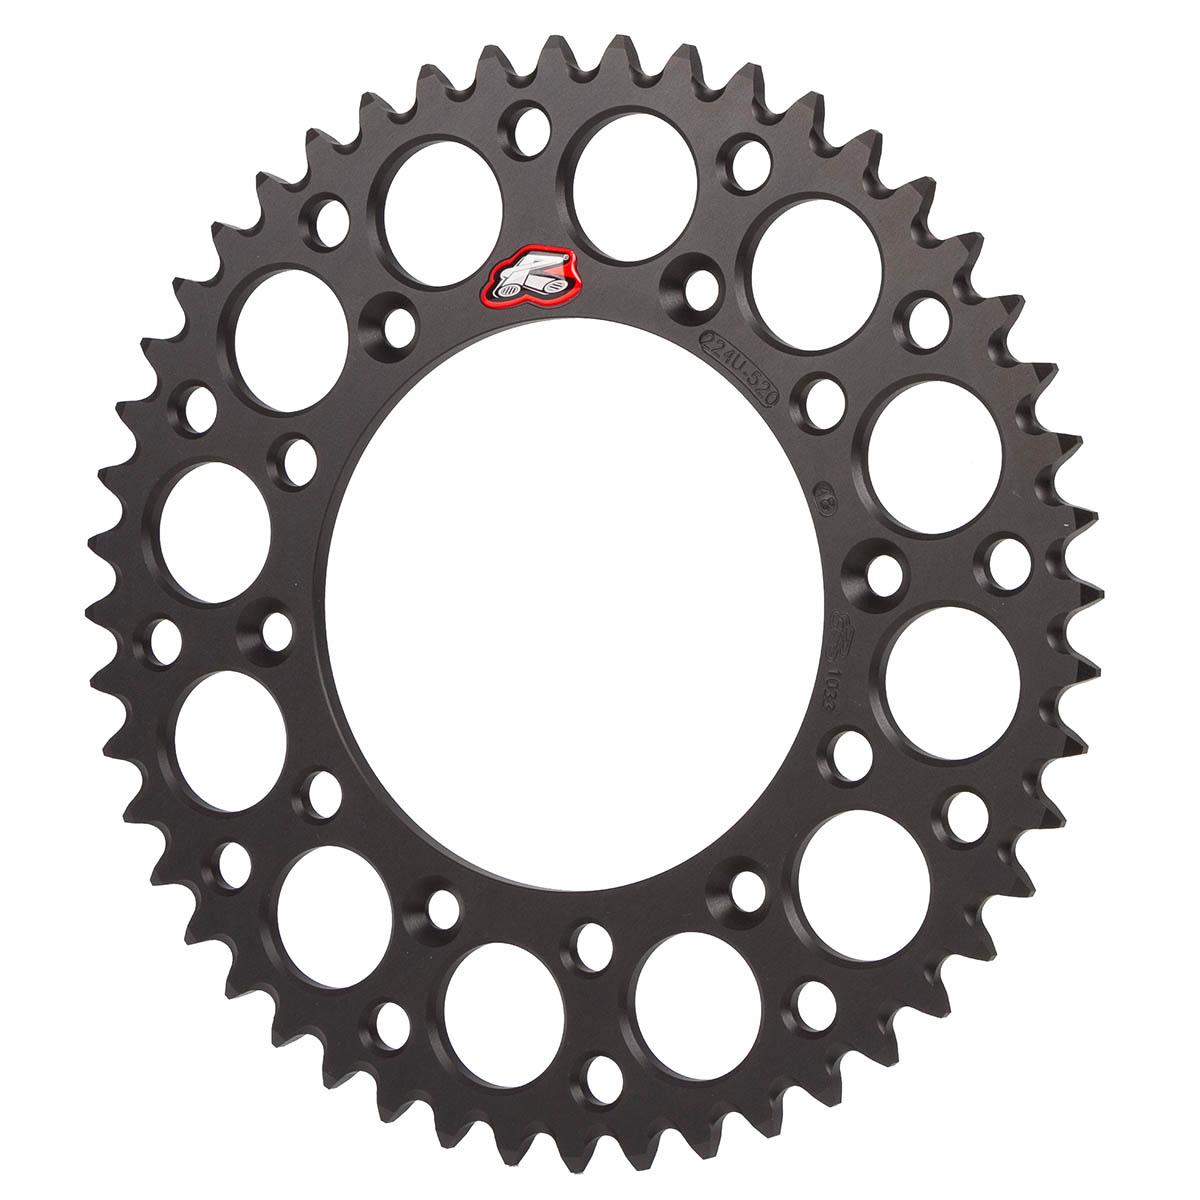 Renthal Kettenrad  KTM/Husqvarna, 520 Teilung, Aluminium, Schwarz, 48-52 Zähne